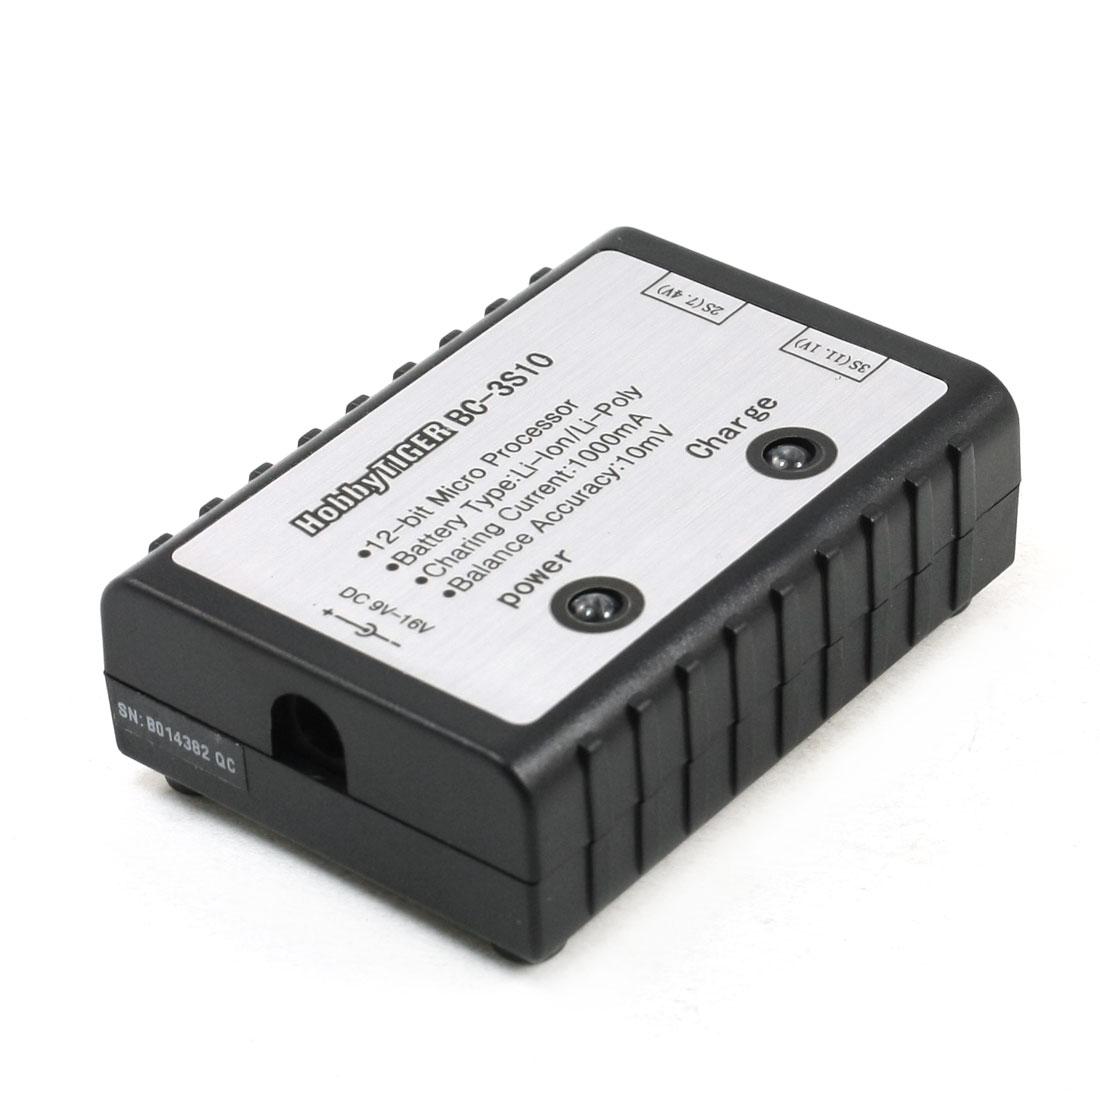 BC-3S10 1000mA Balance Charger 2S/3S 7.4V 11.1V Li-Po/LI-ION Battery